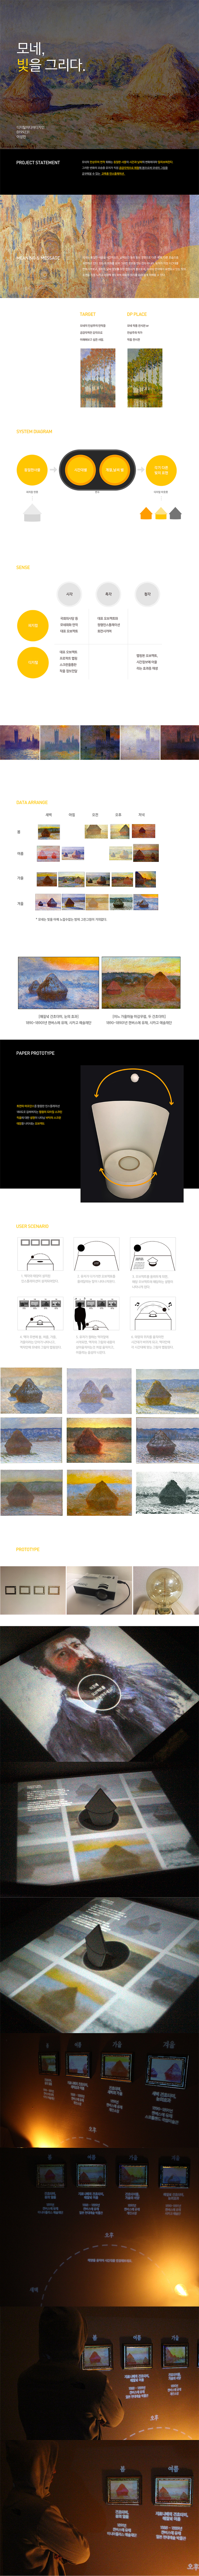 Lee sung min   Monet : Light and Shadow   Information Visualization 2016│ Major in Digital Media Design │#hicoda │hicoda.hongik.ac.kr